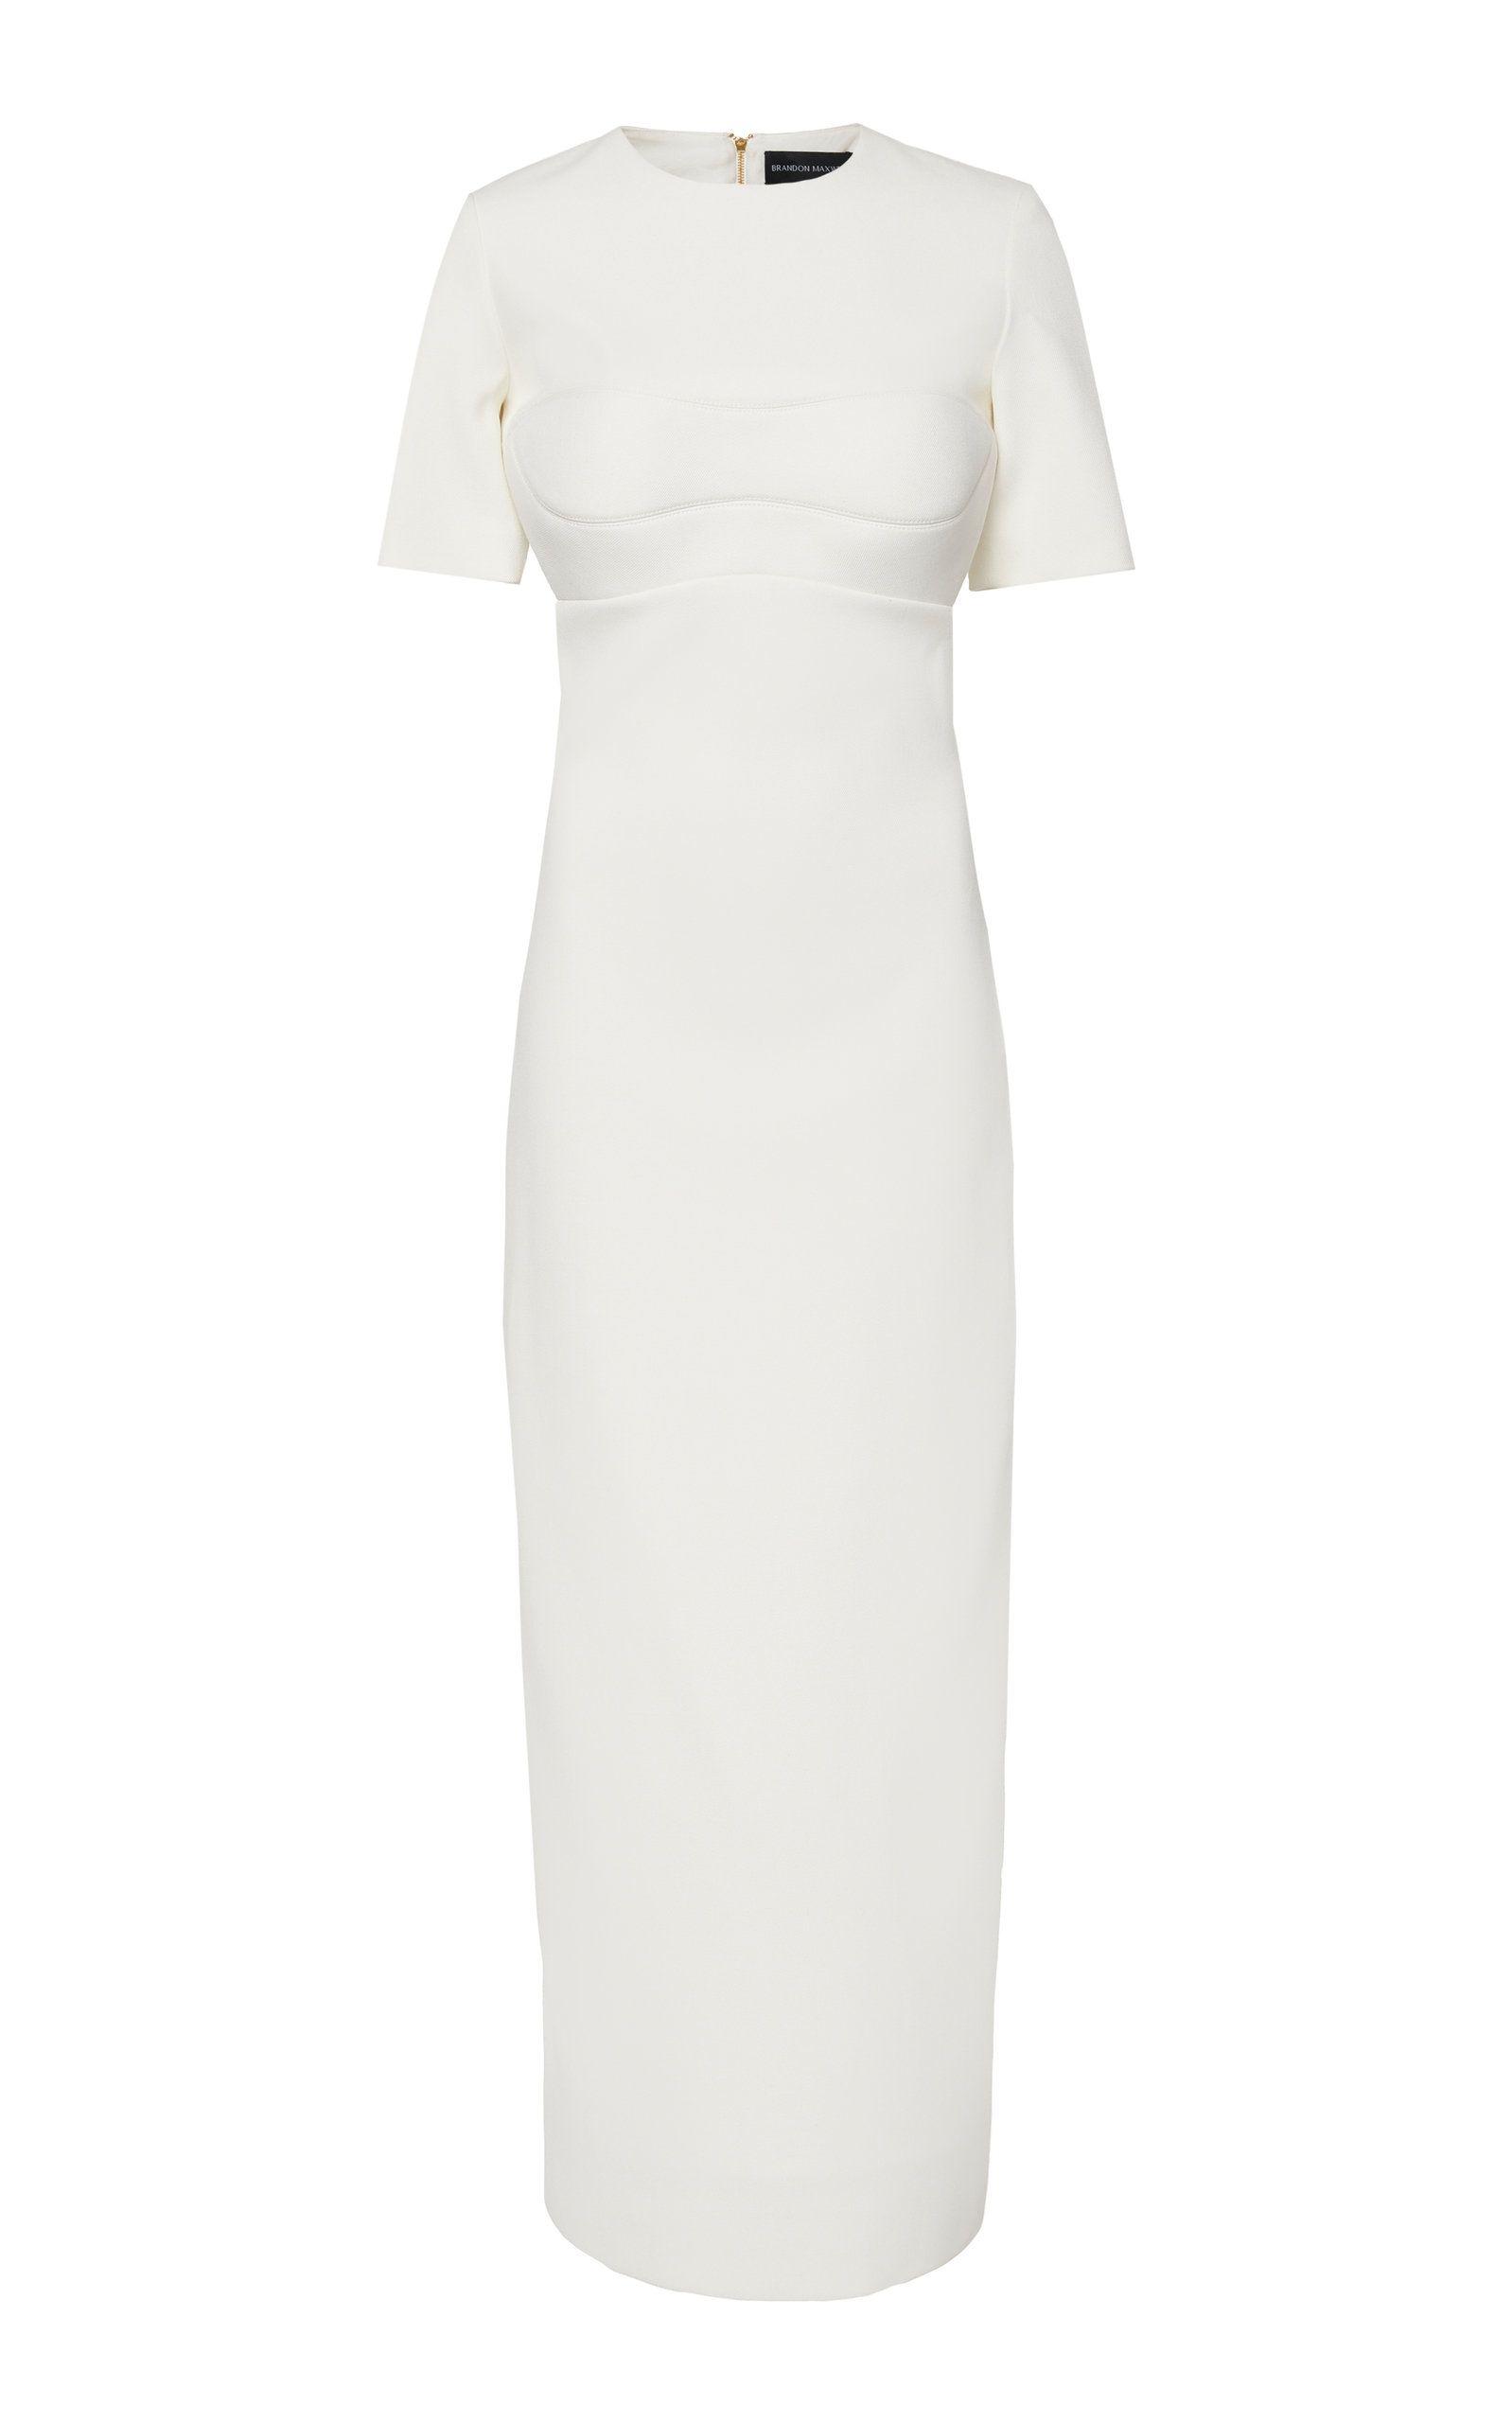 06fb960c642 Backless Cady Maxi Dress by BRANDON MAXWELL for Preorder on Moda Operandi